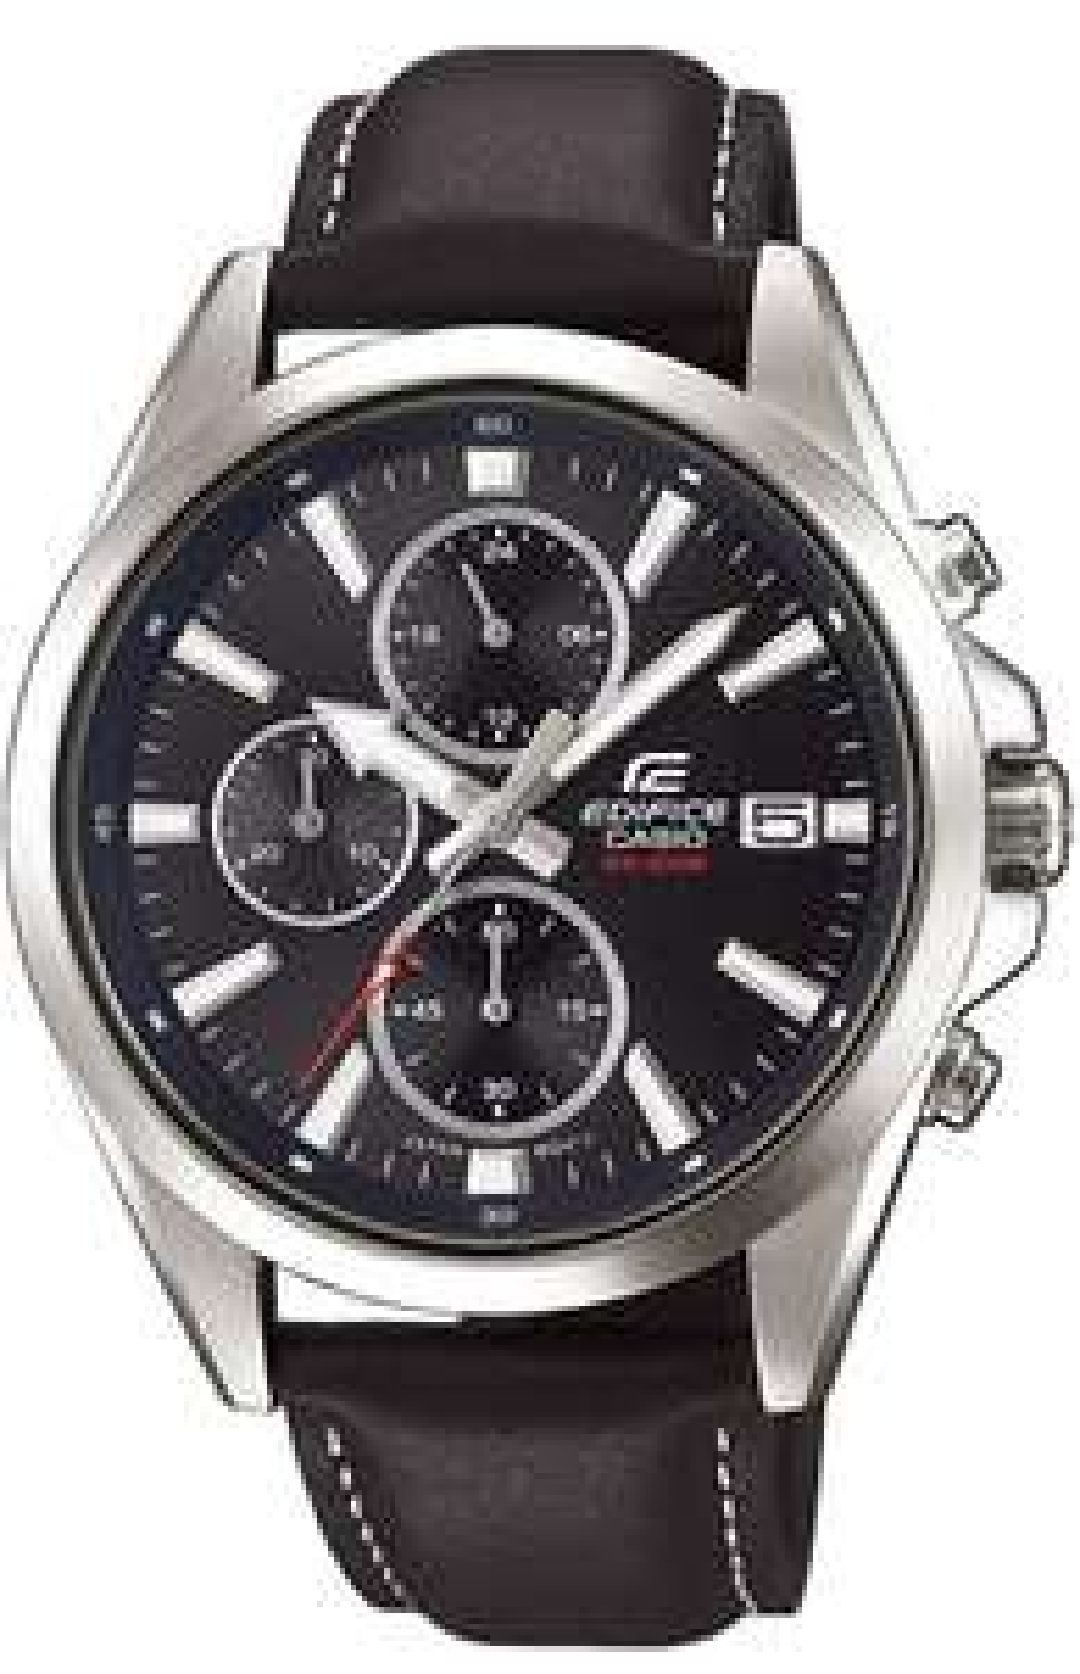 Casio Edifice Analogue Quartz Watch EFV-560L-1AVUEF - £49.31 @ Amazon